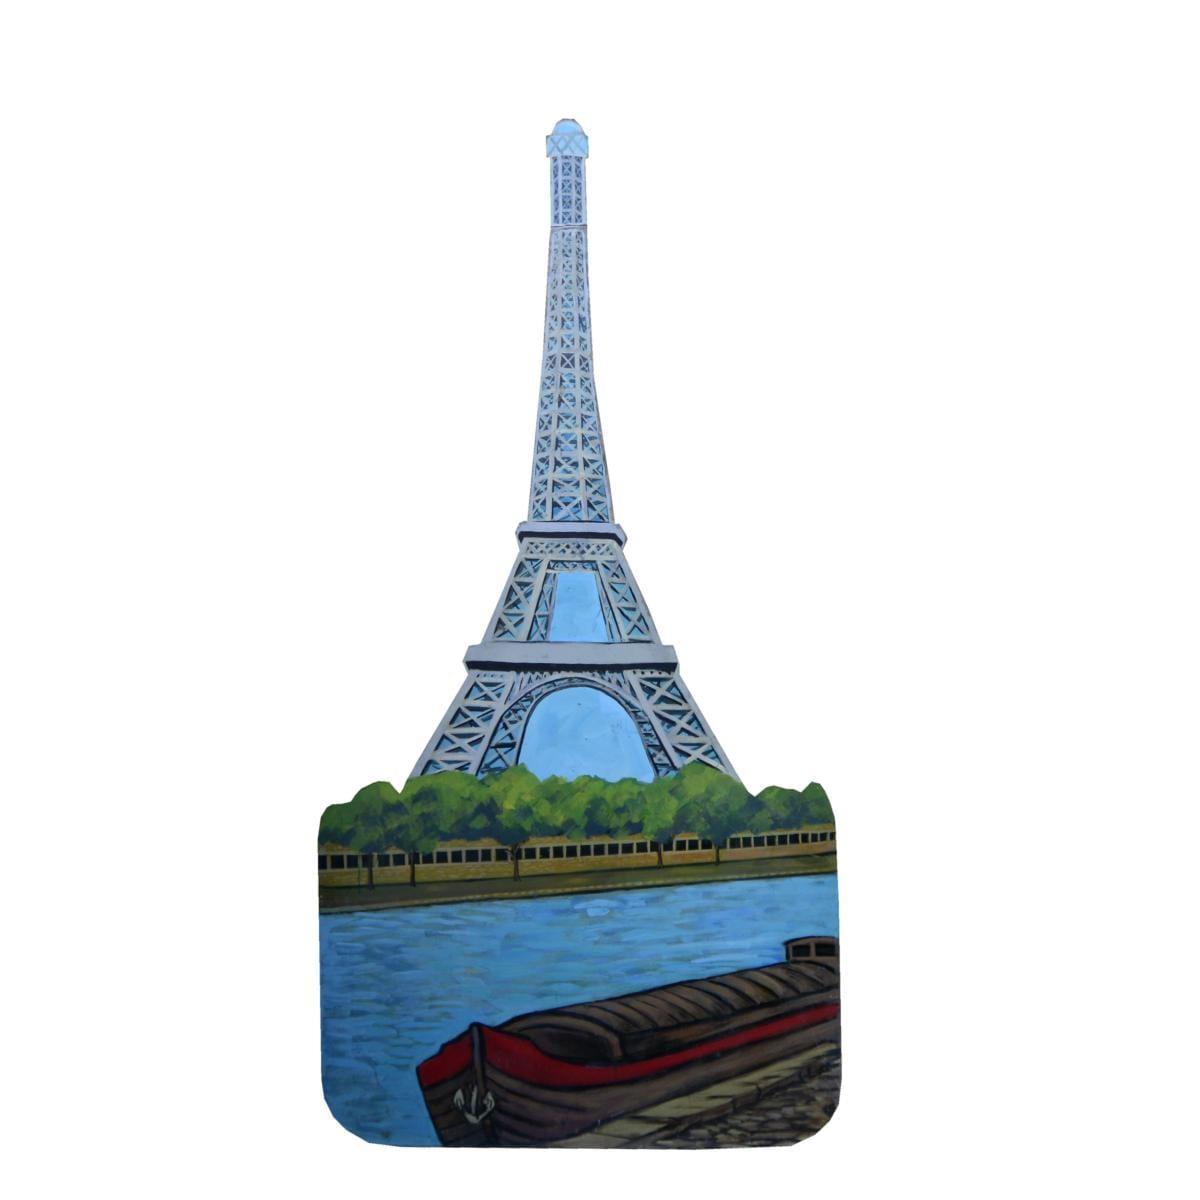 Cutout – Eiffel Tower and the Seine